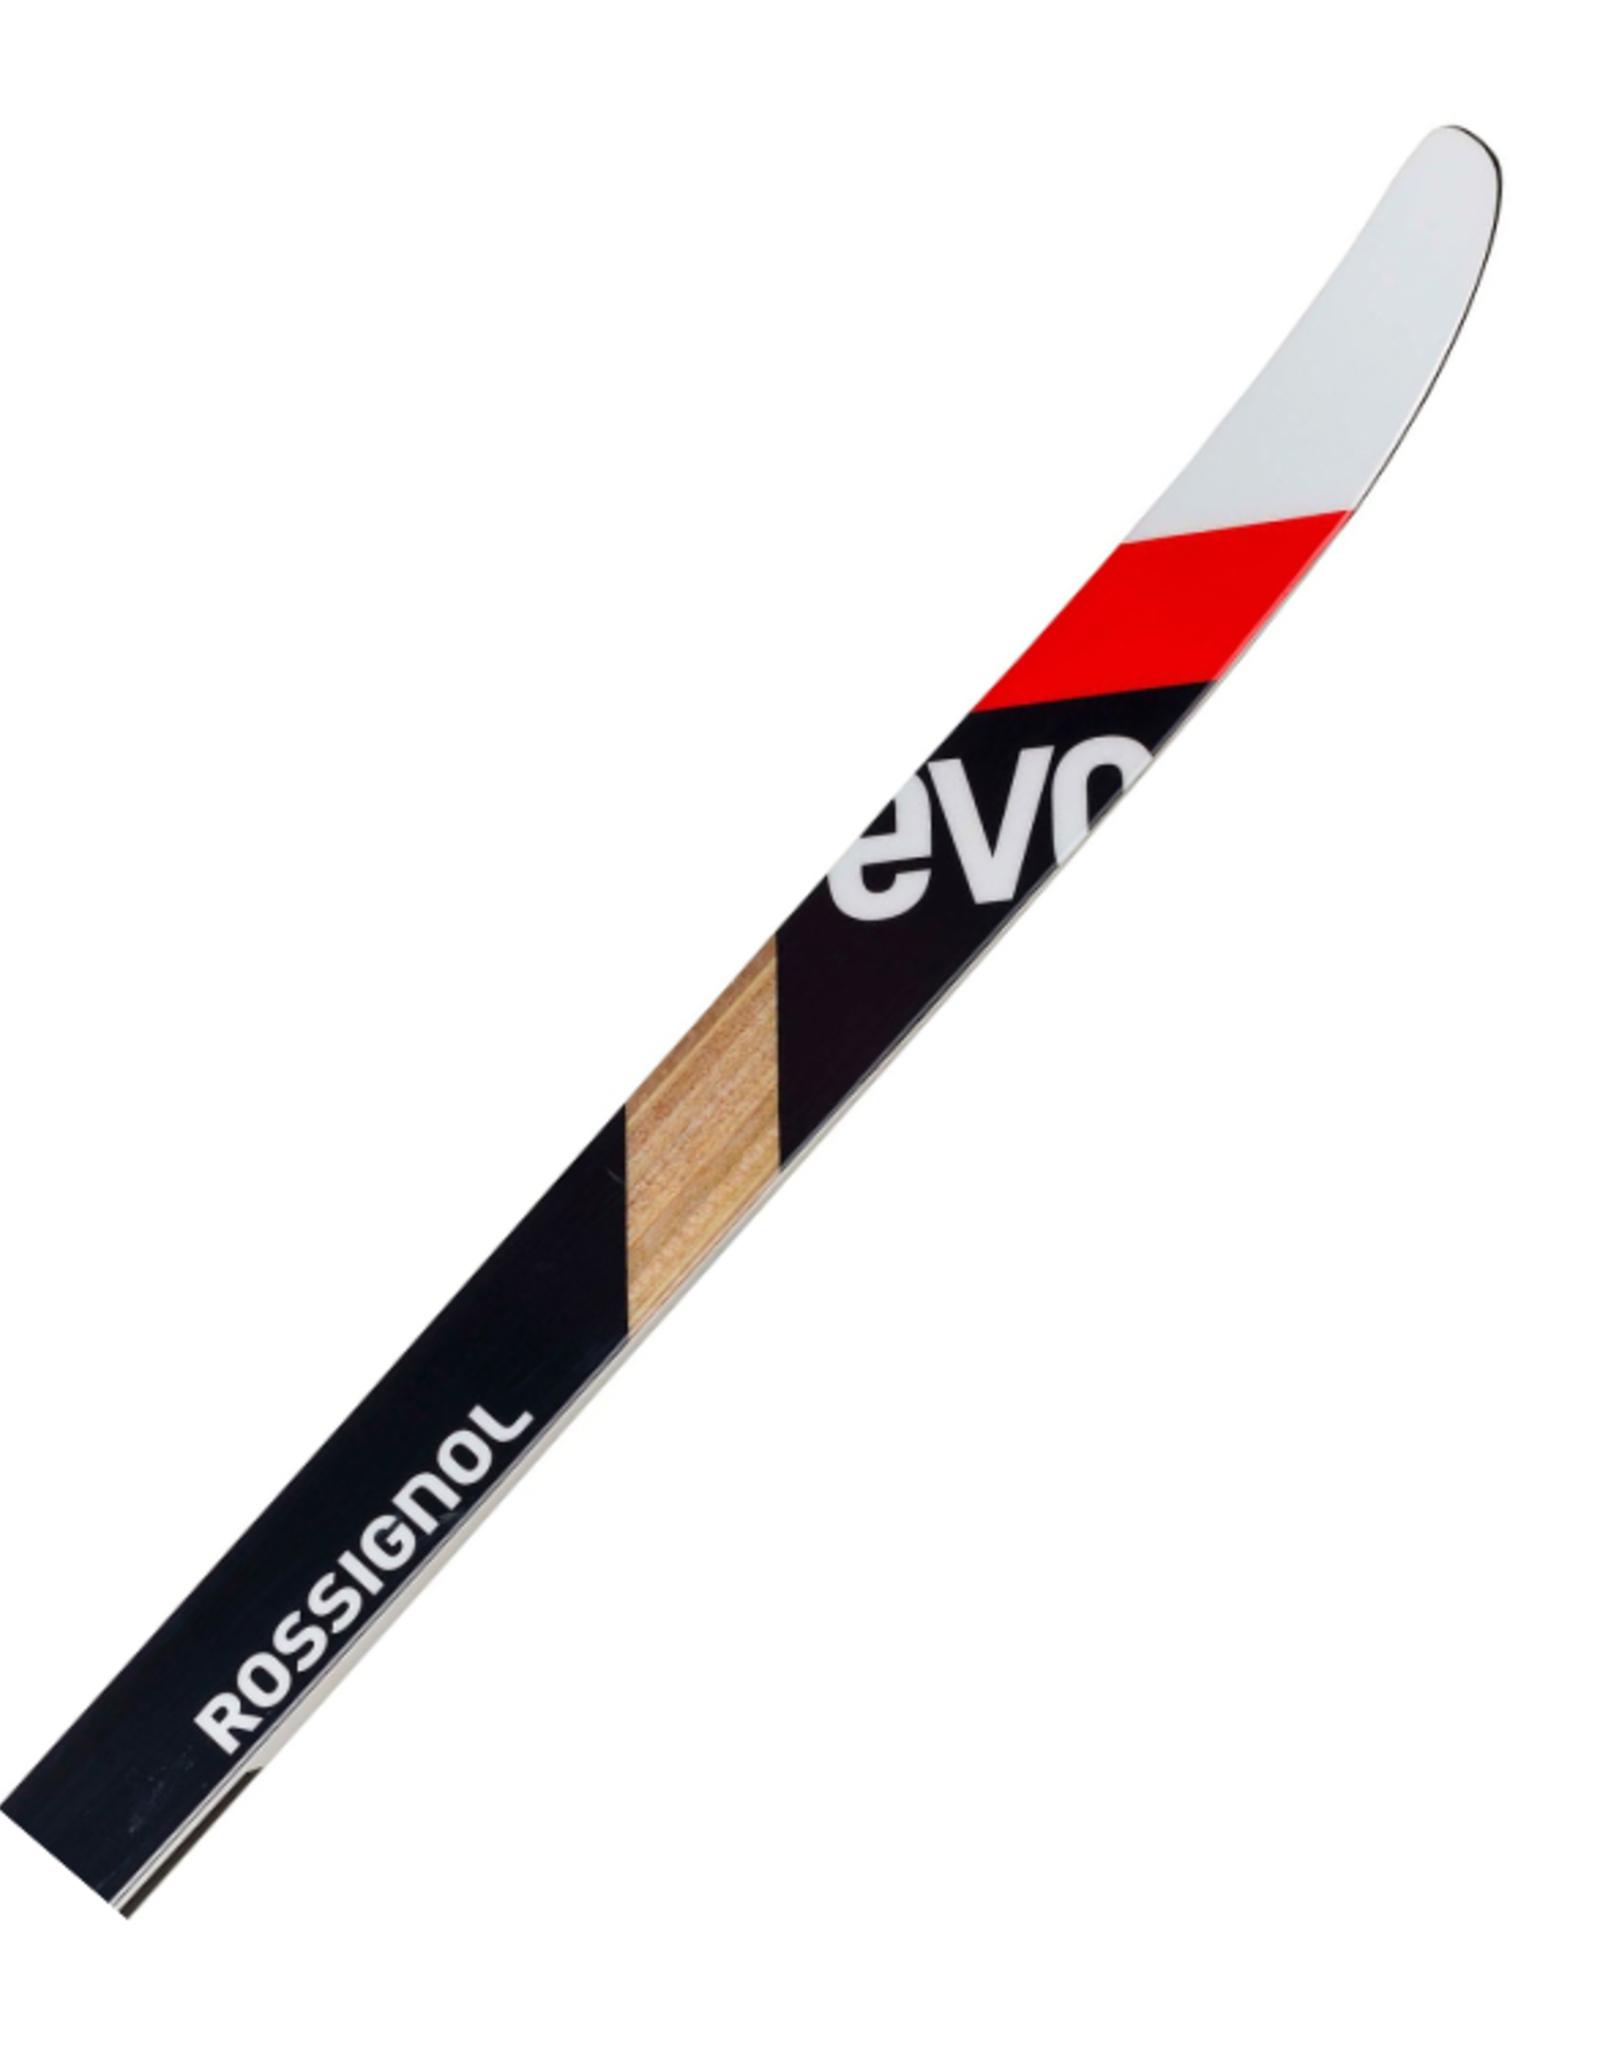 Rossignol Rossignol 2022 EVO XT 55 Positrack IFP XC Ski / Tour Step In